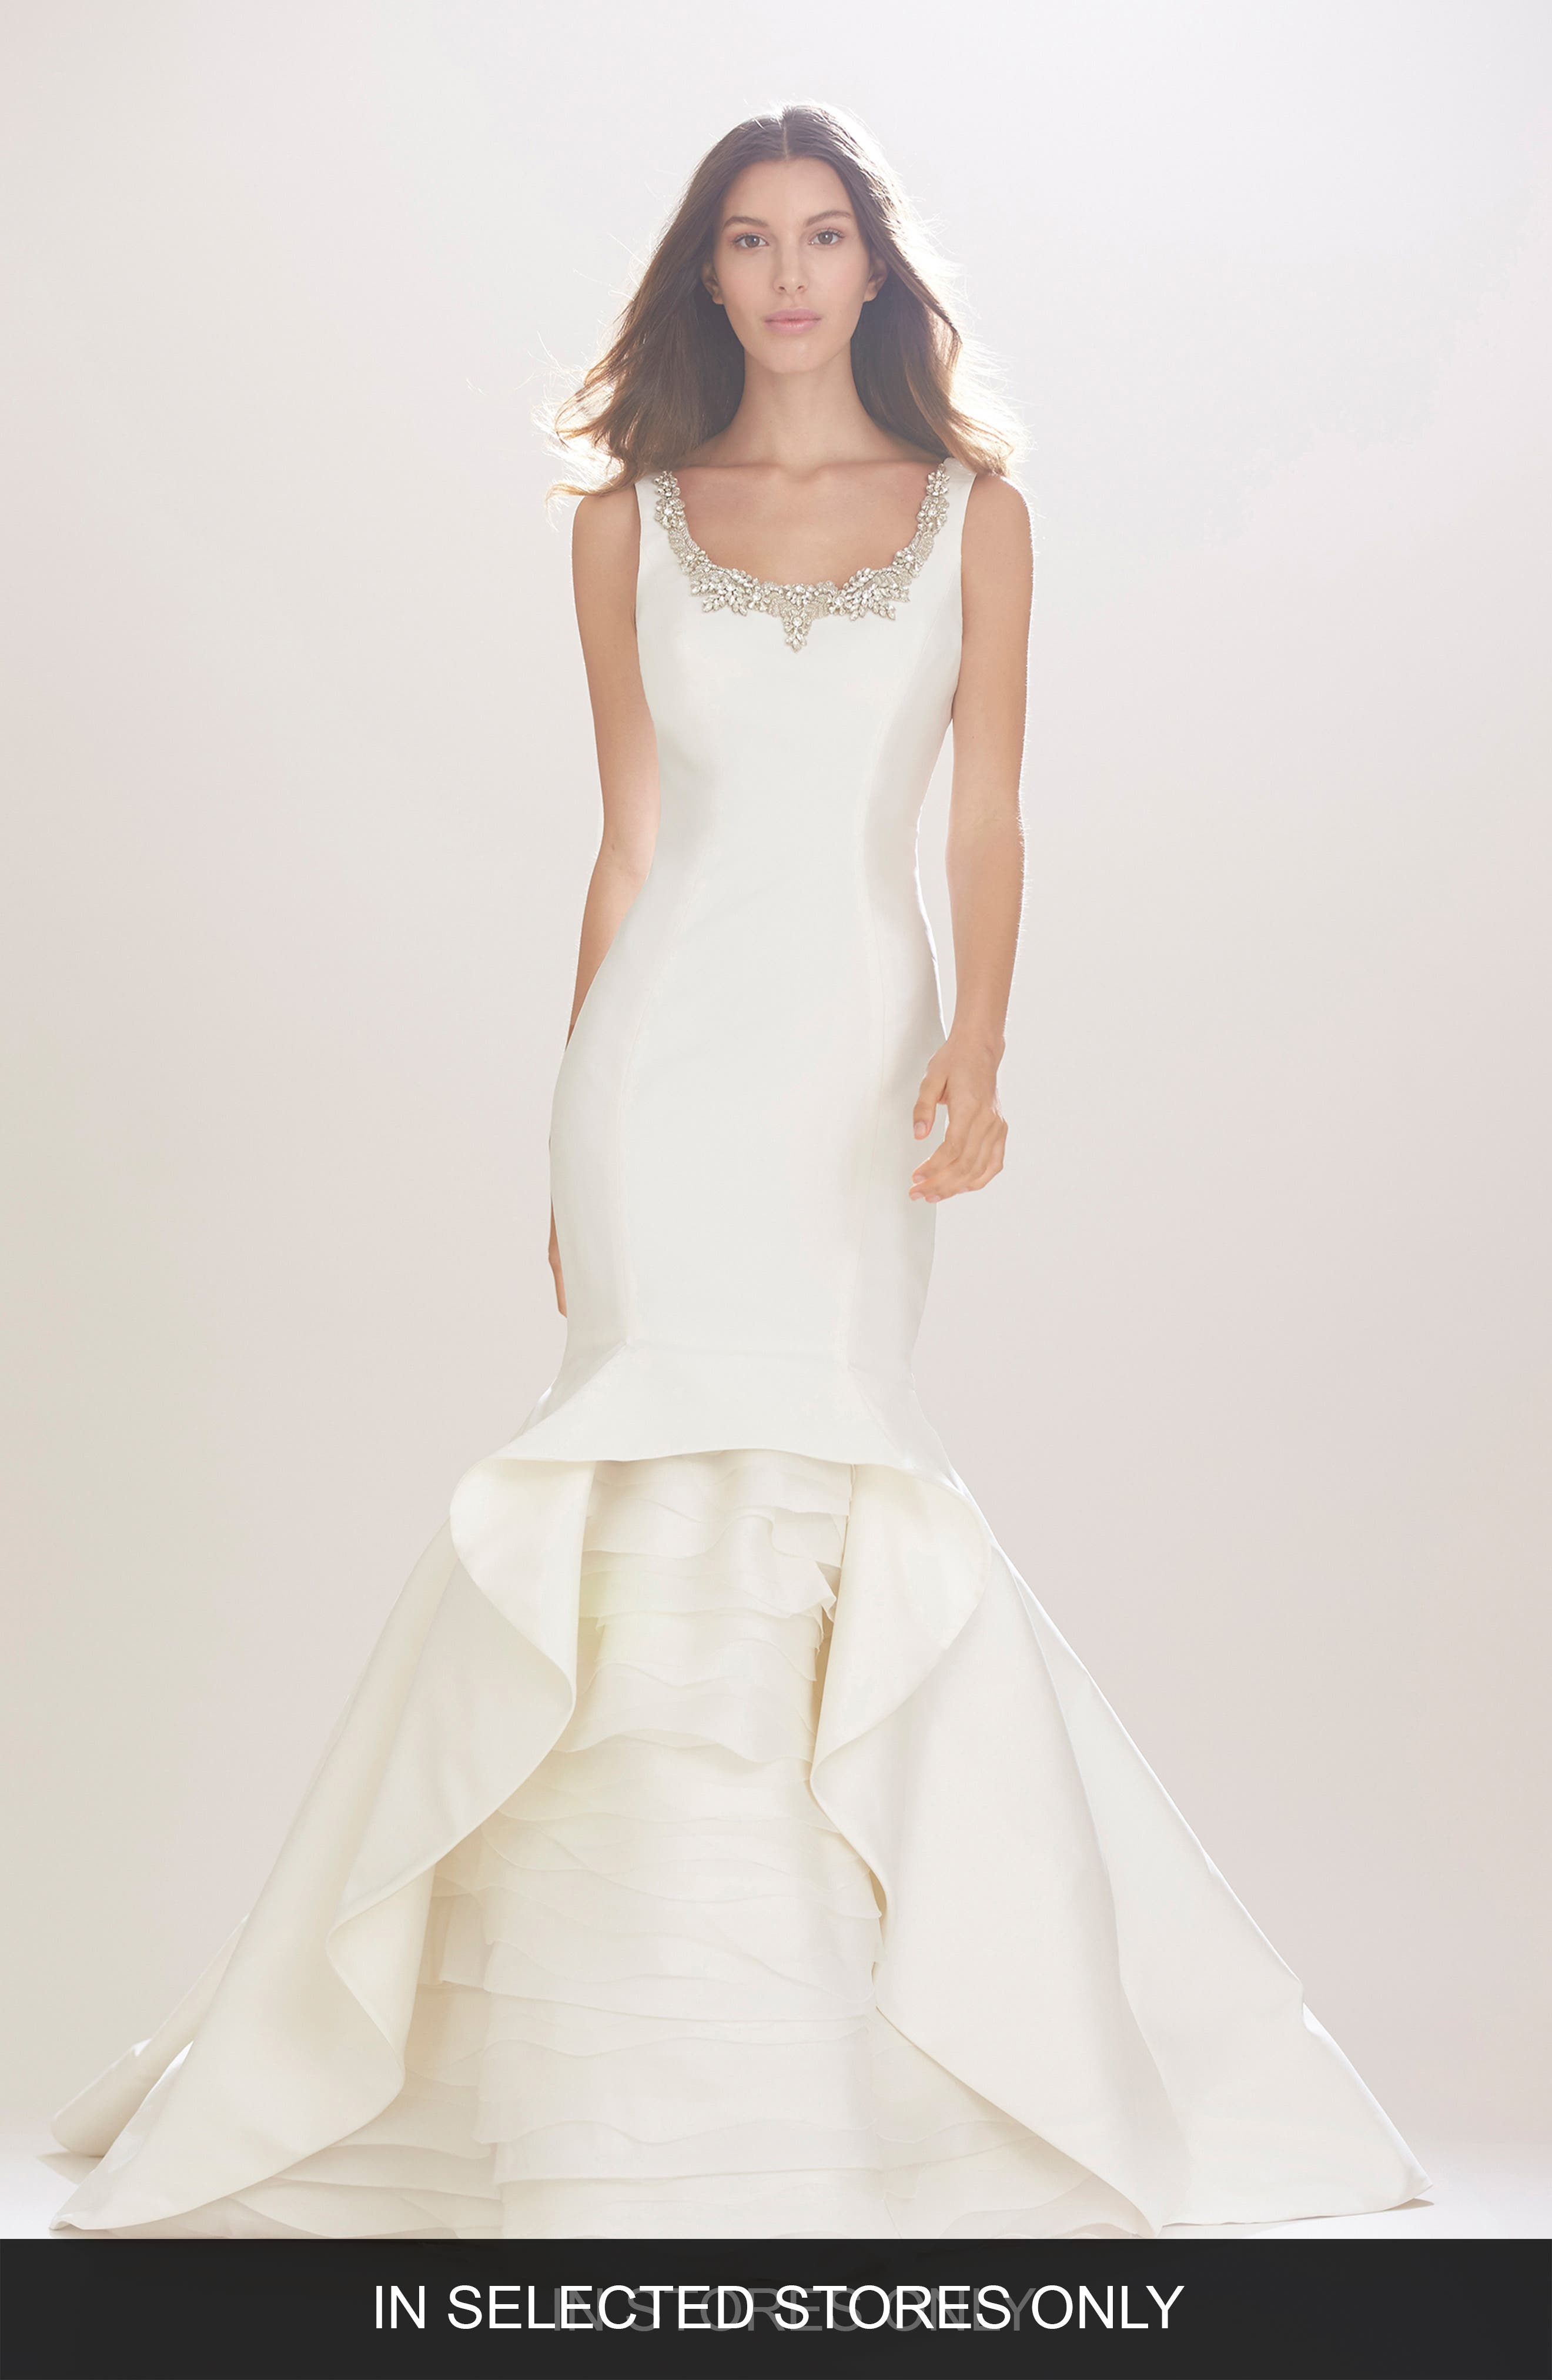 Carolina Herrera 'Madison' Embroidered Scoop Neck Silk Mikado Trumpet Gown with Tiered Organza Underlay (In Stores Only)